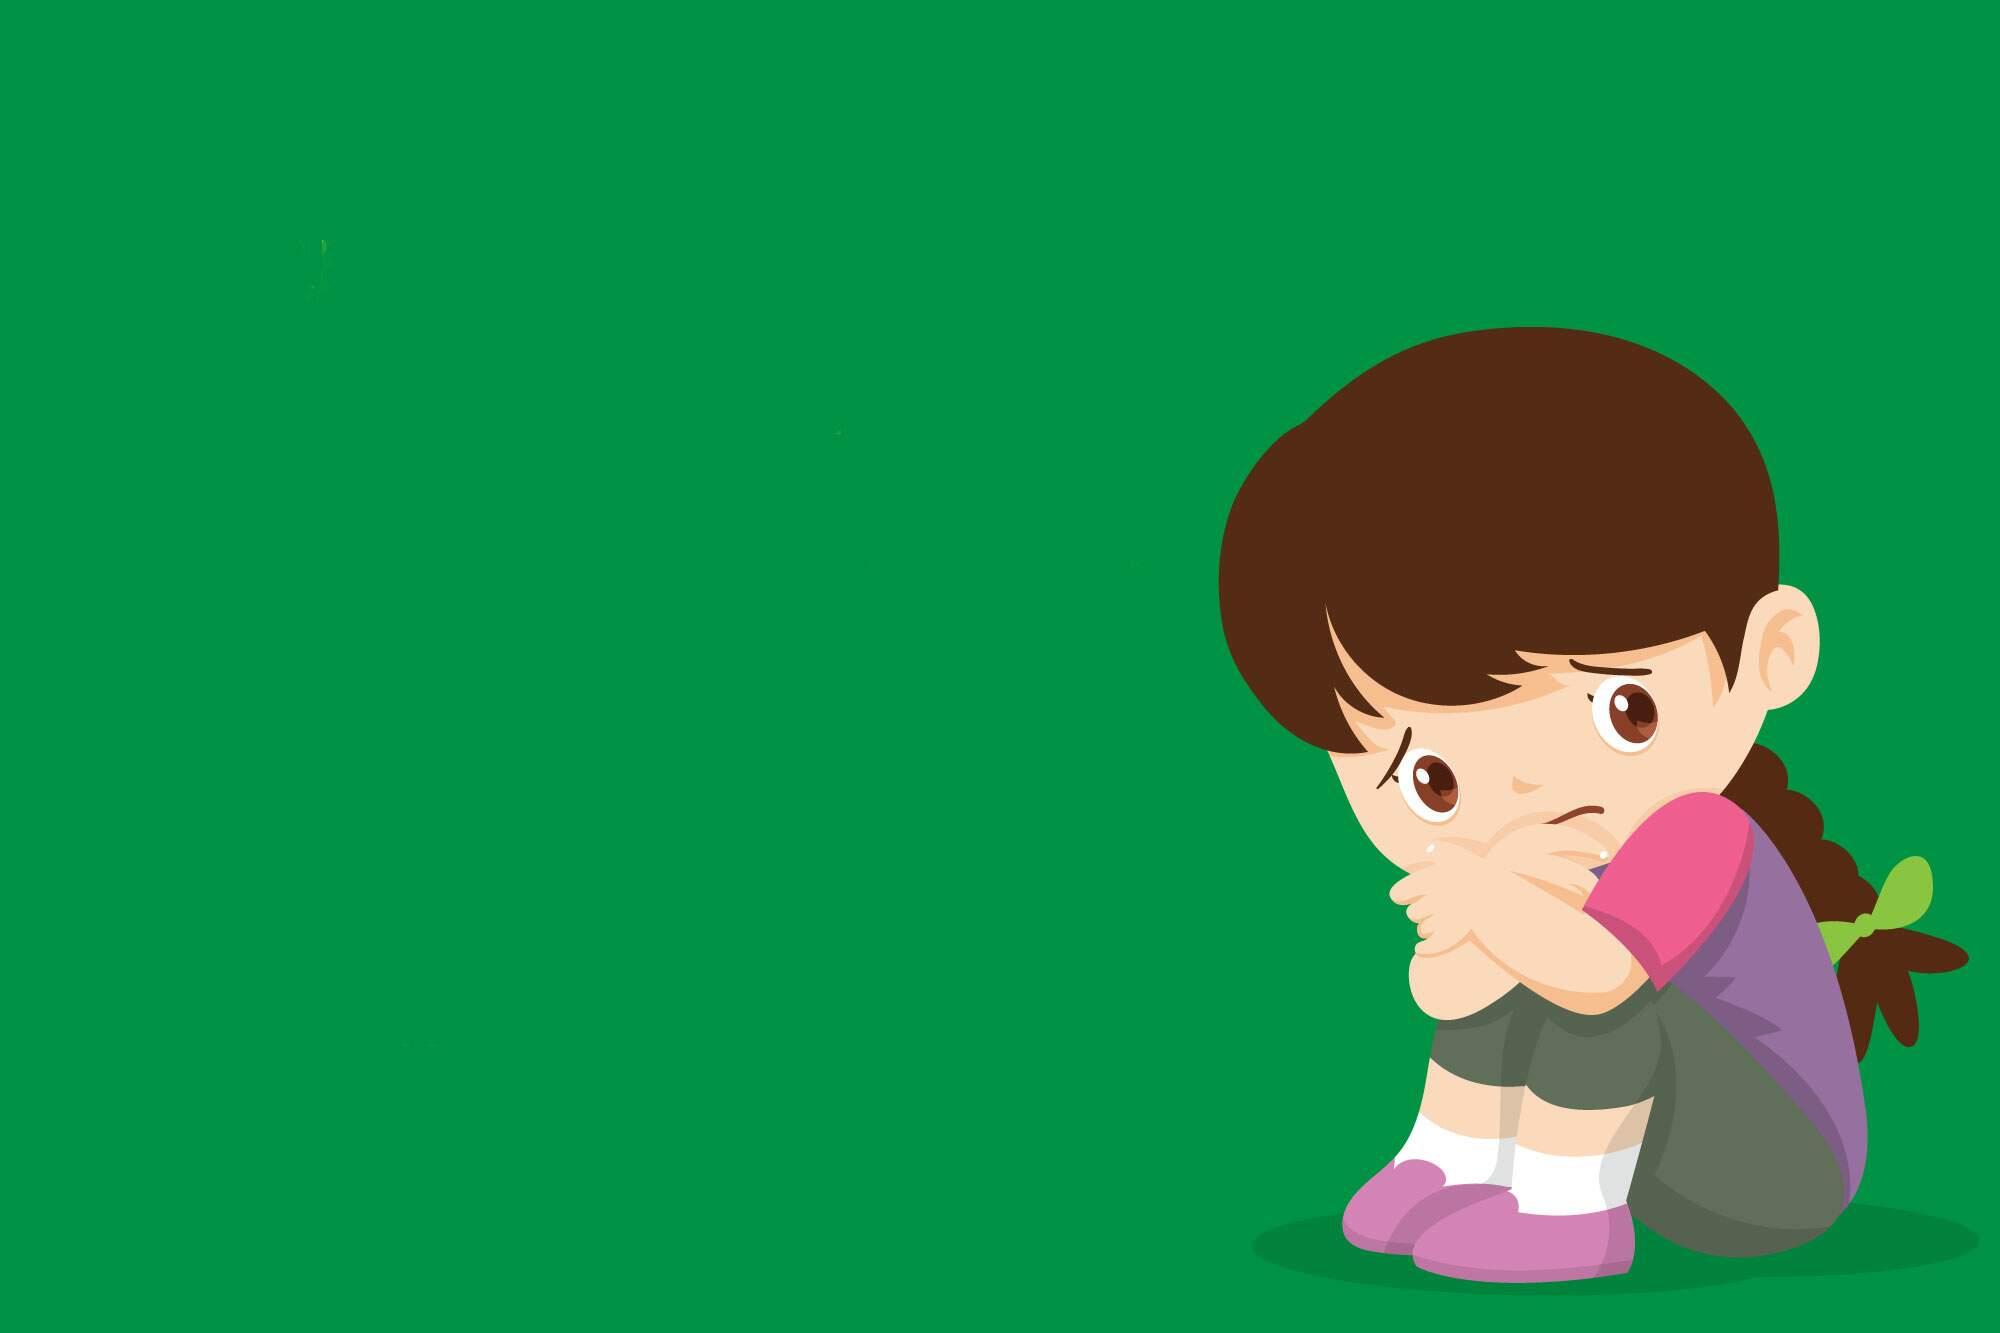 esquizofrenia infantil como perceber os sinais sintomas